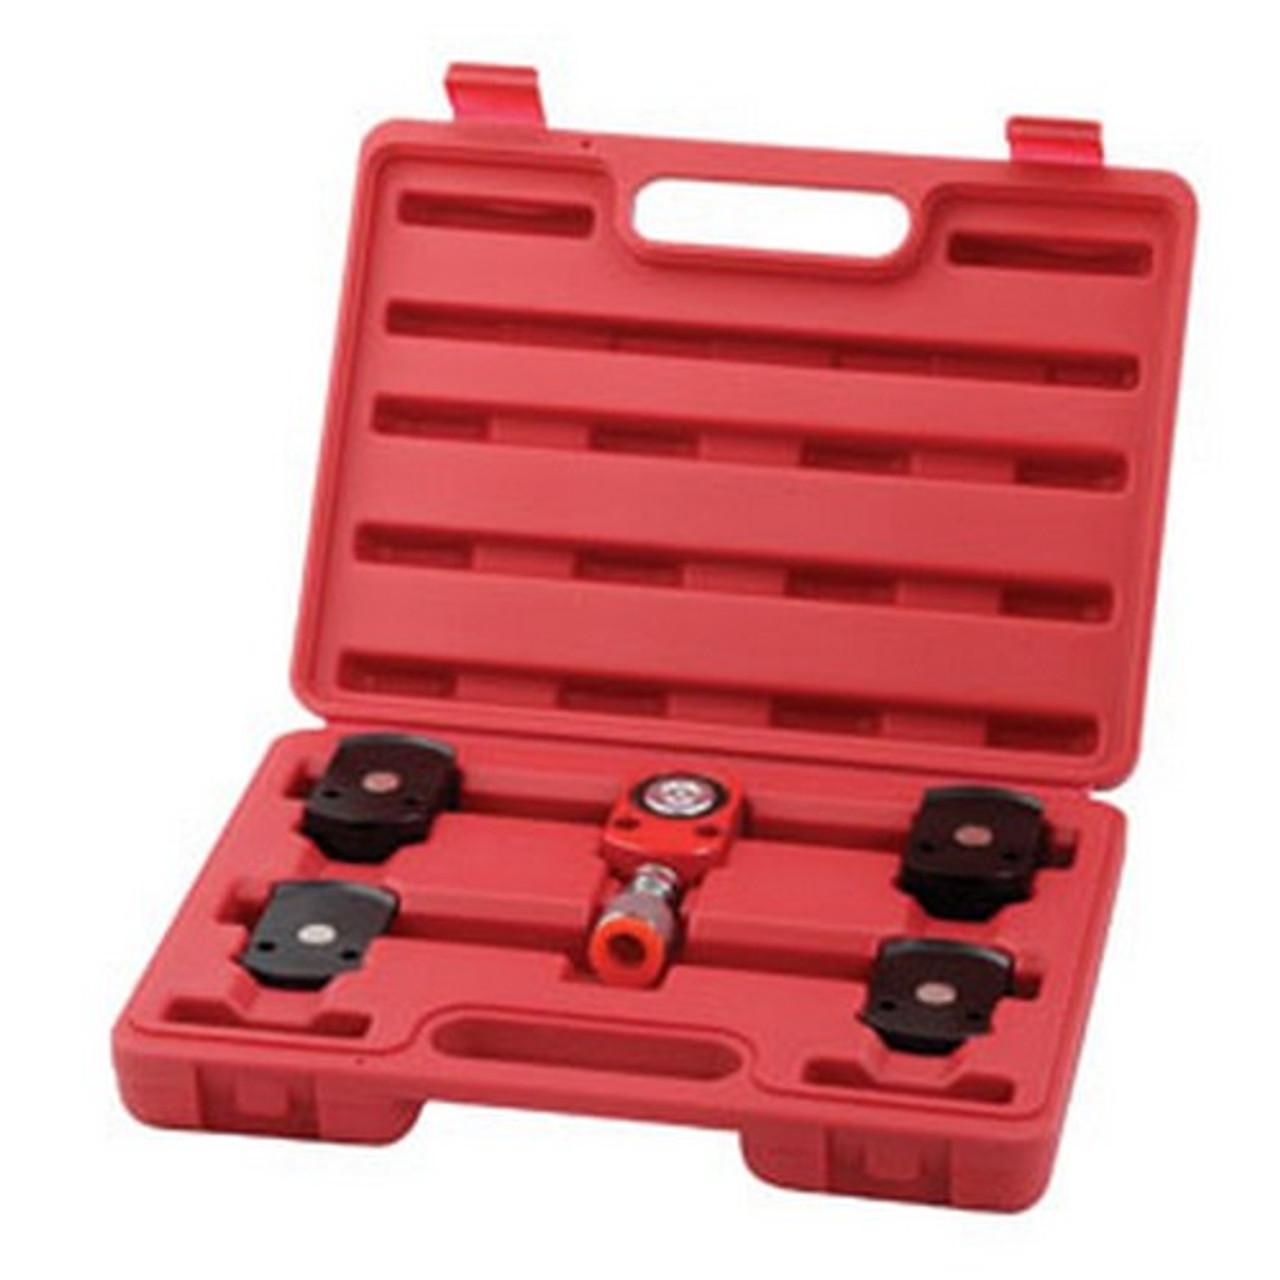 10pc ATD Tools 576 Star T-Handle Set